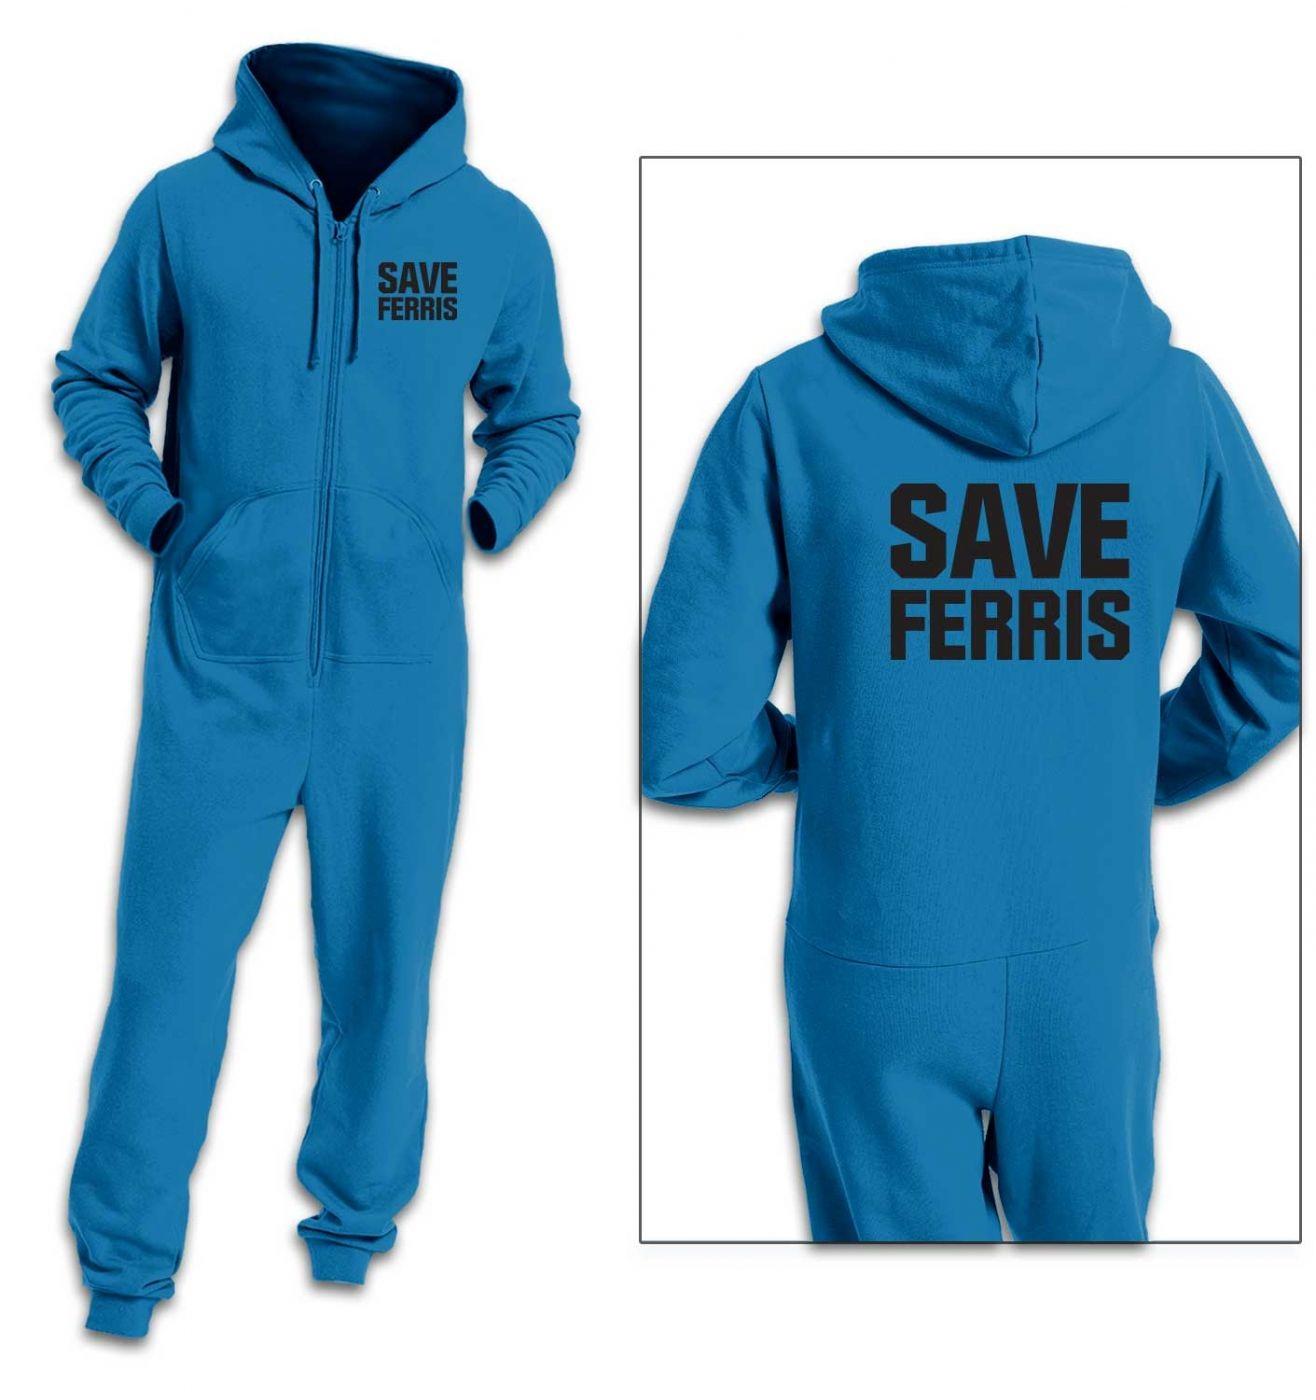 Save Ferris onesie